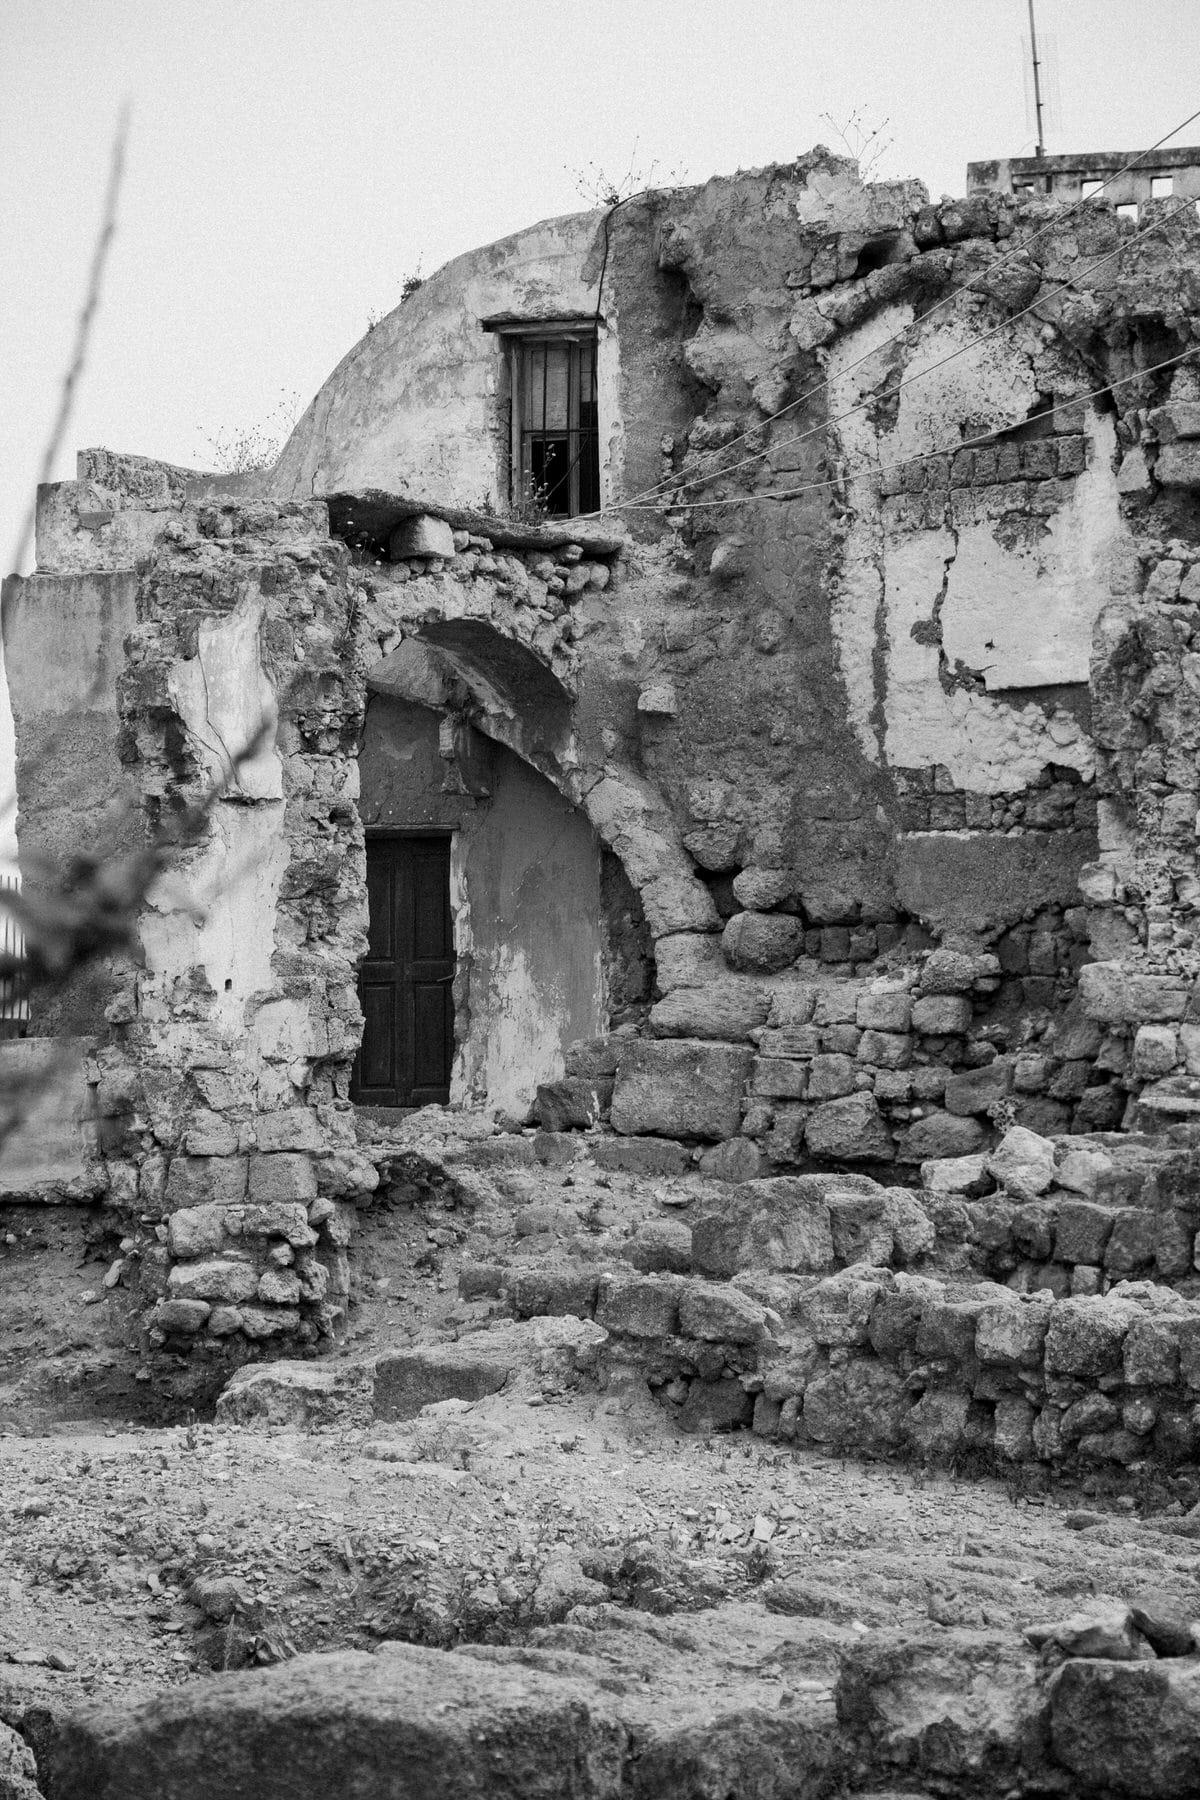 Rhodes-Greece-Island-black-and-white-fine-art-photography-by-Studio-L-photographer-Laura-Schneider-_2582